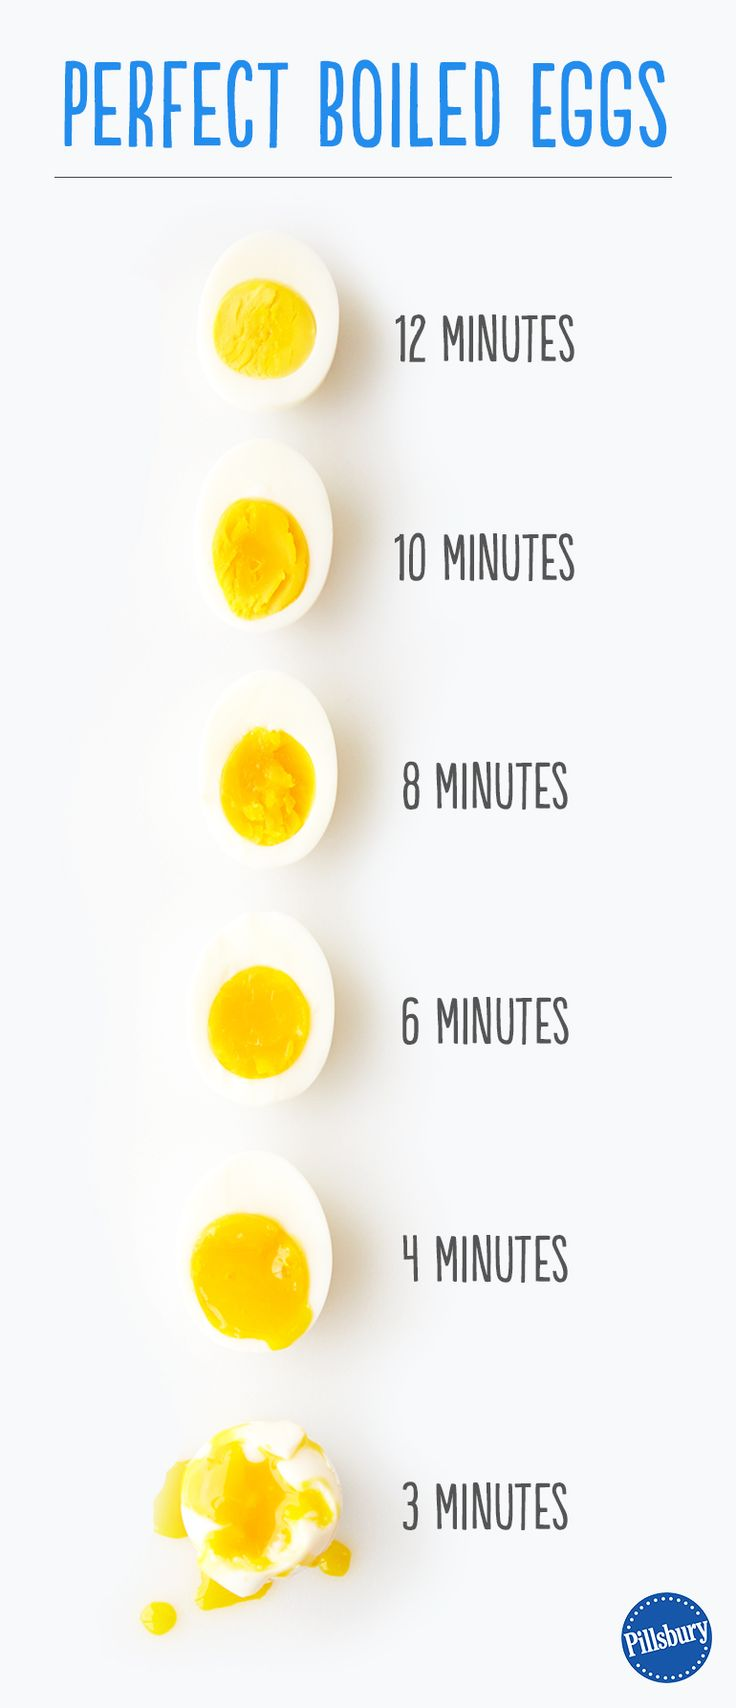 How to Boil Eggs from Pillsbury.com